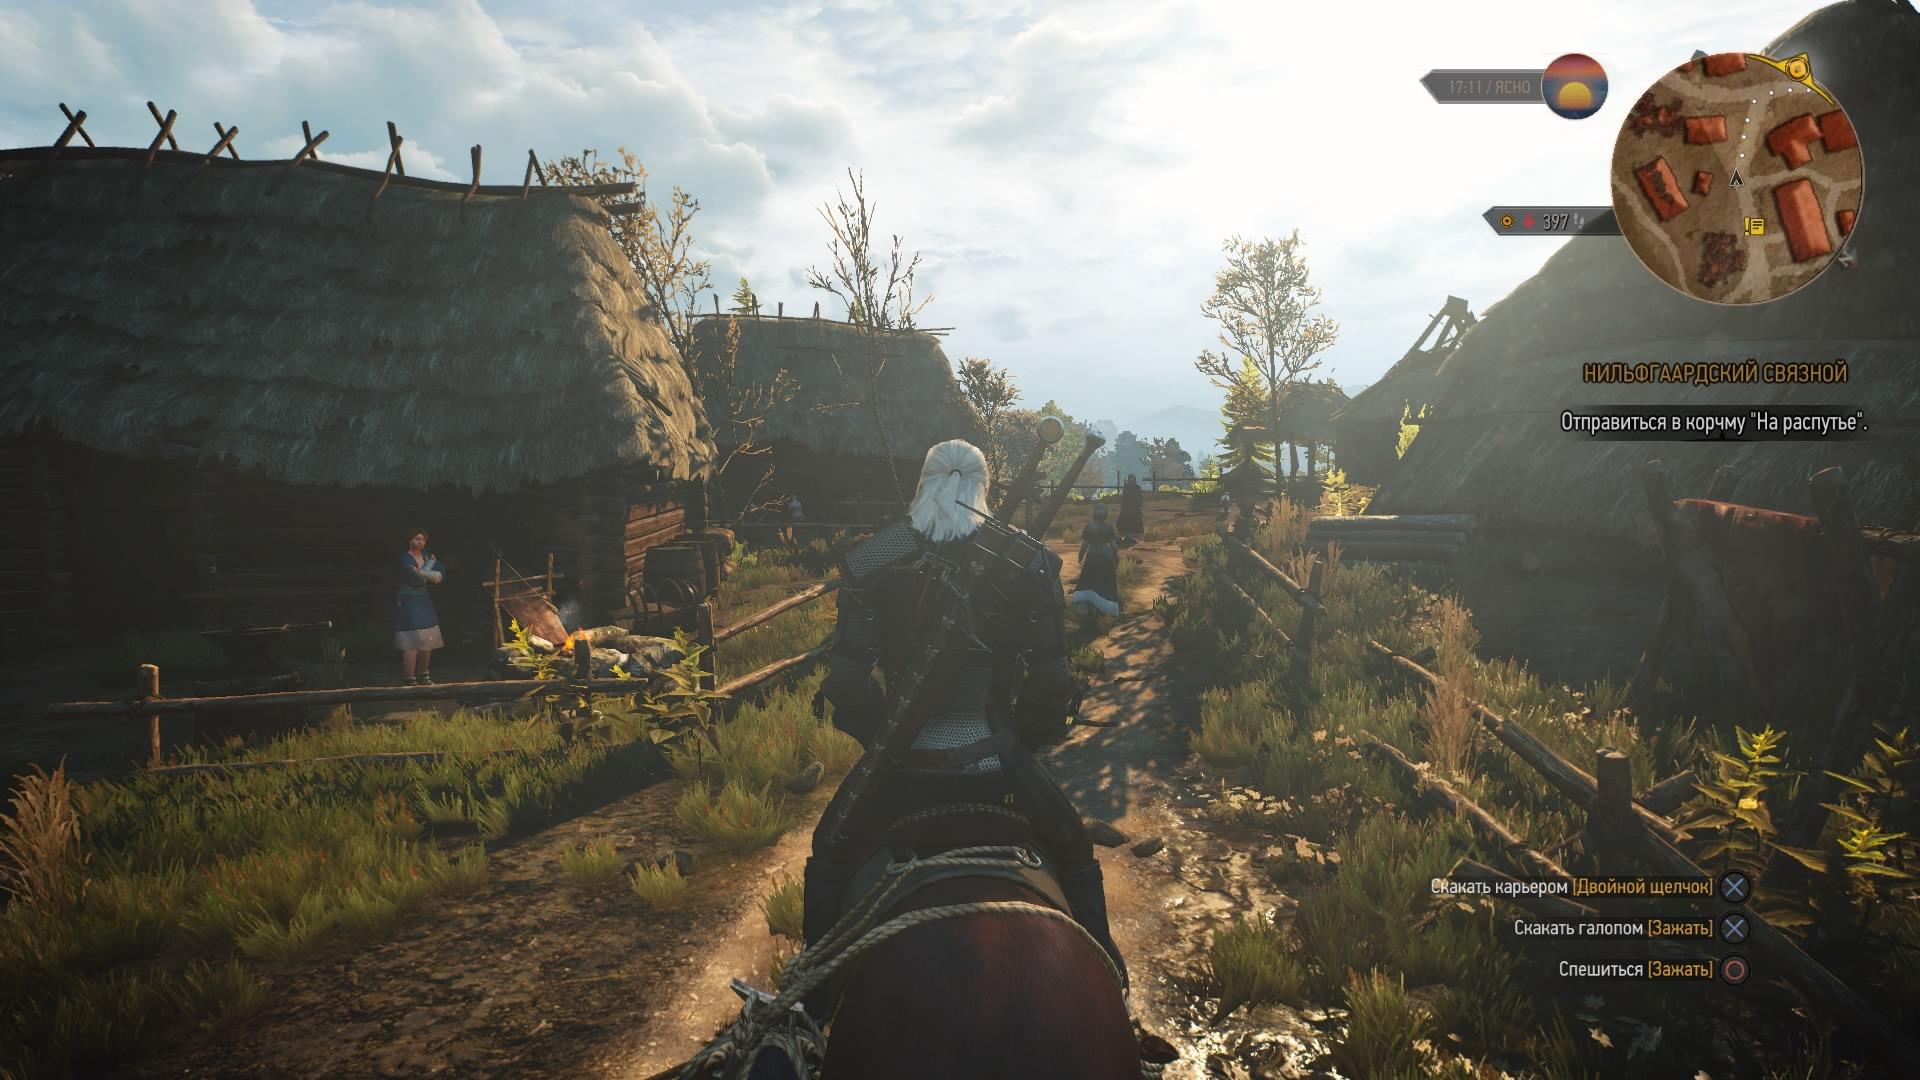 Деревня Яворник.jpg - Witcher 3: Wild Hunt, the